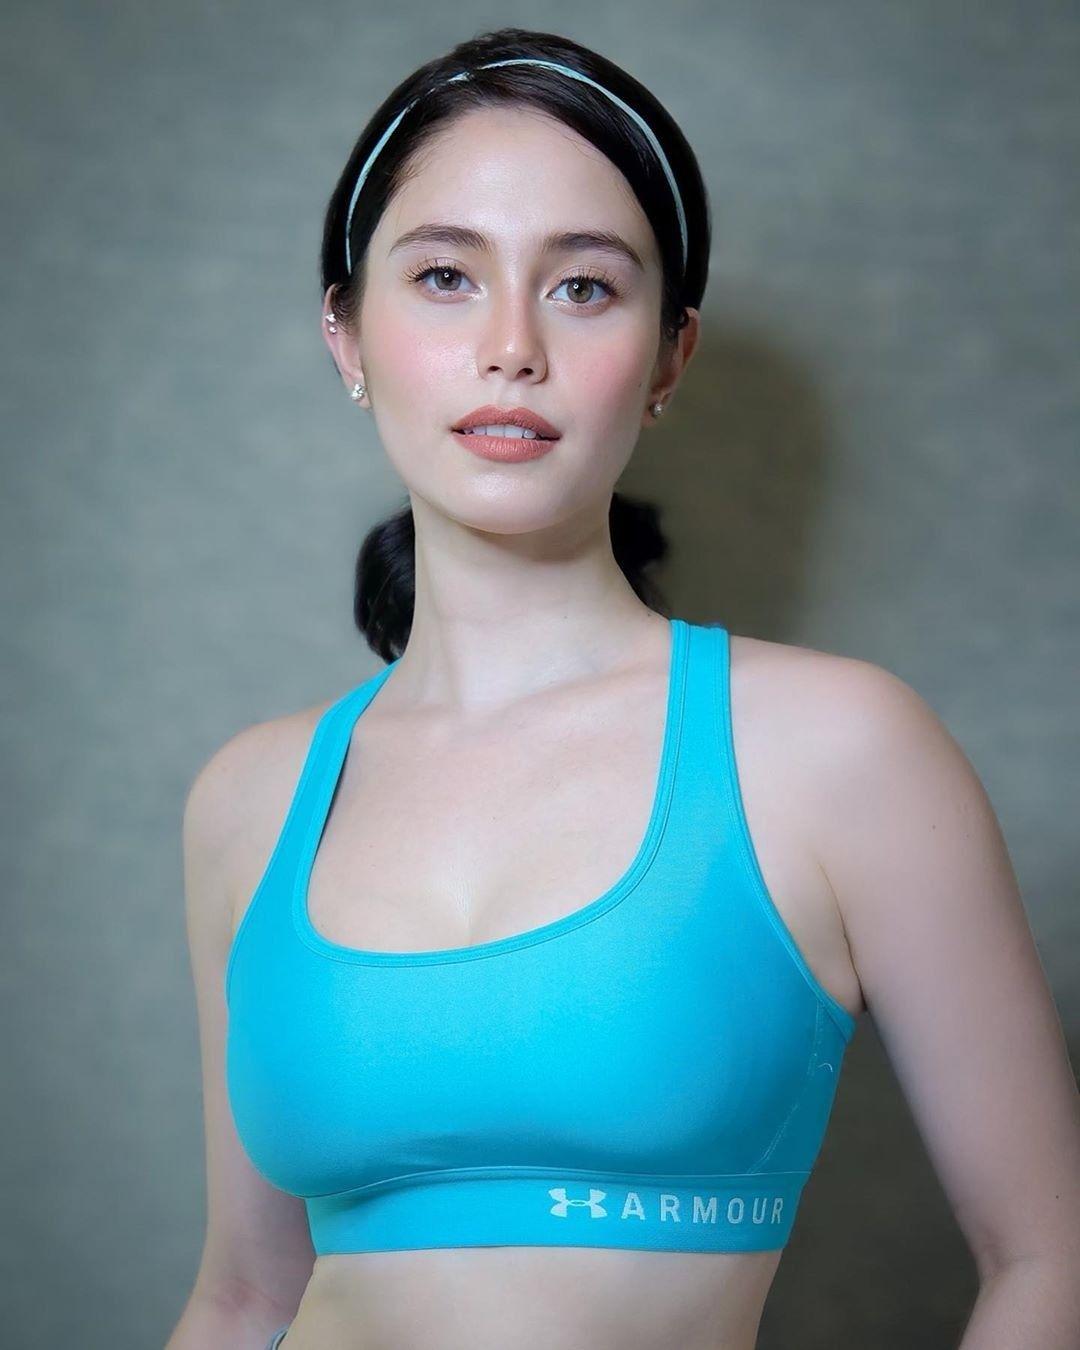 Pin on Filipina celebrity crushes